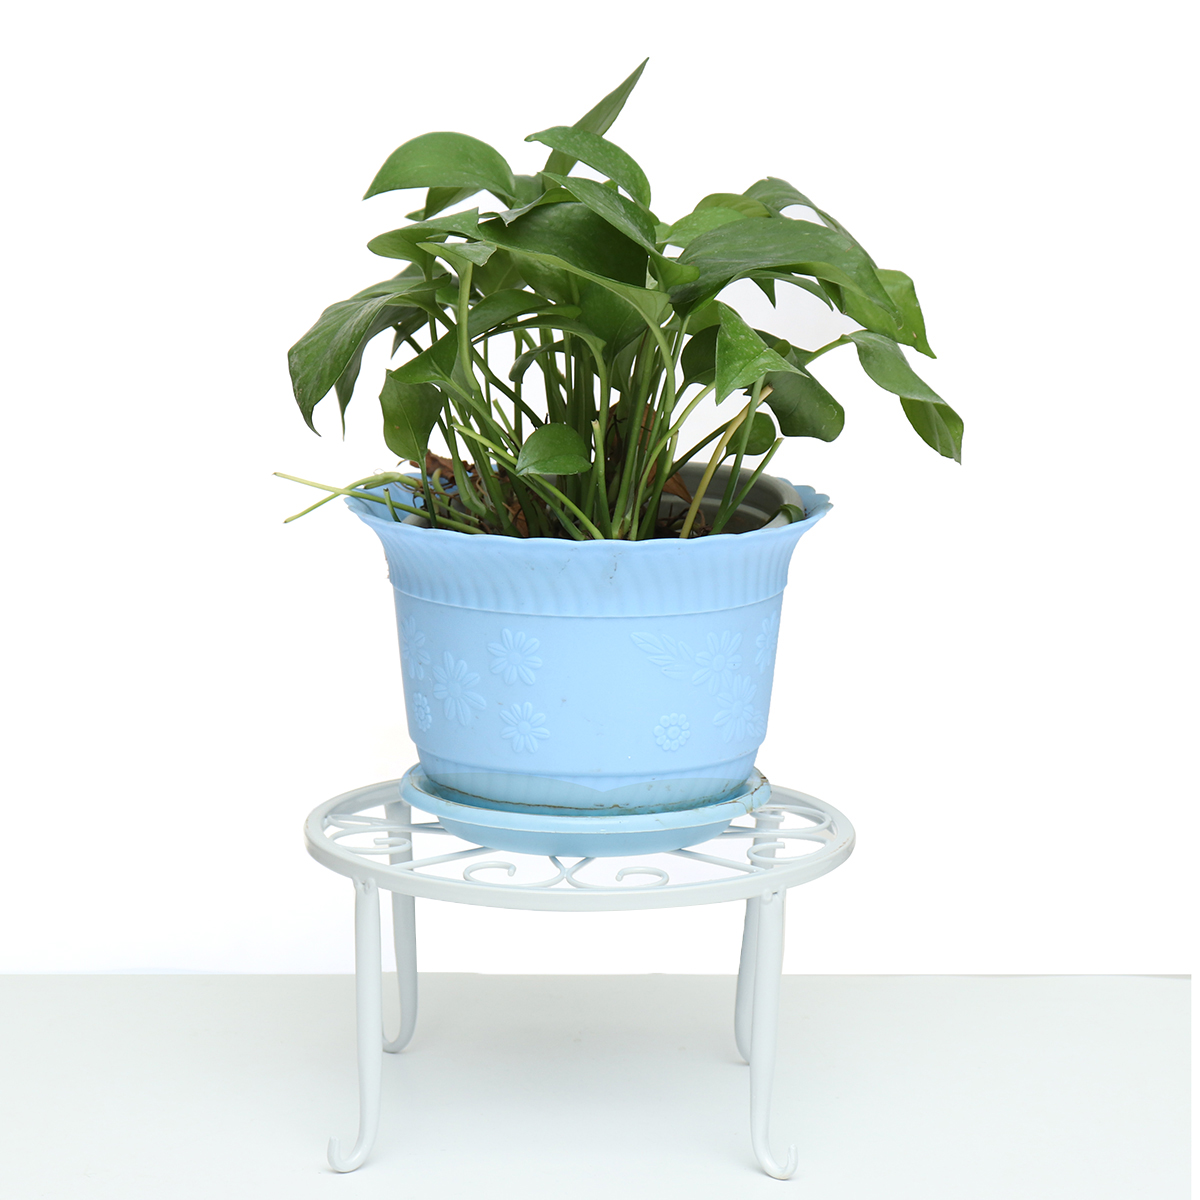 Wrought Iron Pot Plant Stand Flower Shelf Indoor Outdoor Garden Decor 24*24*13cm